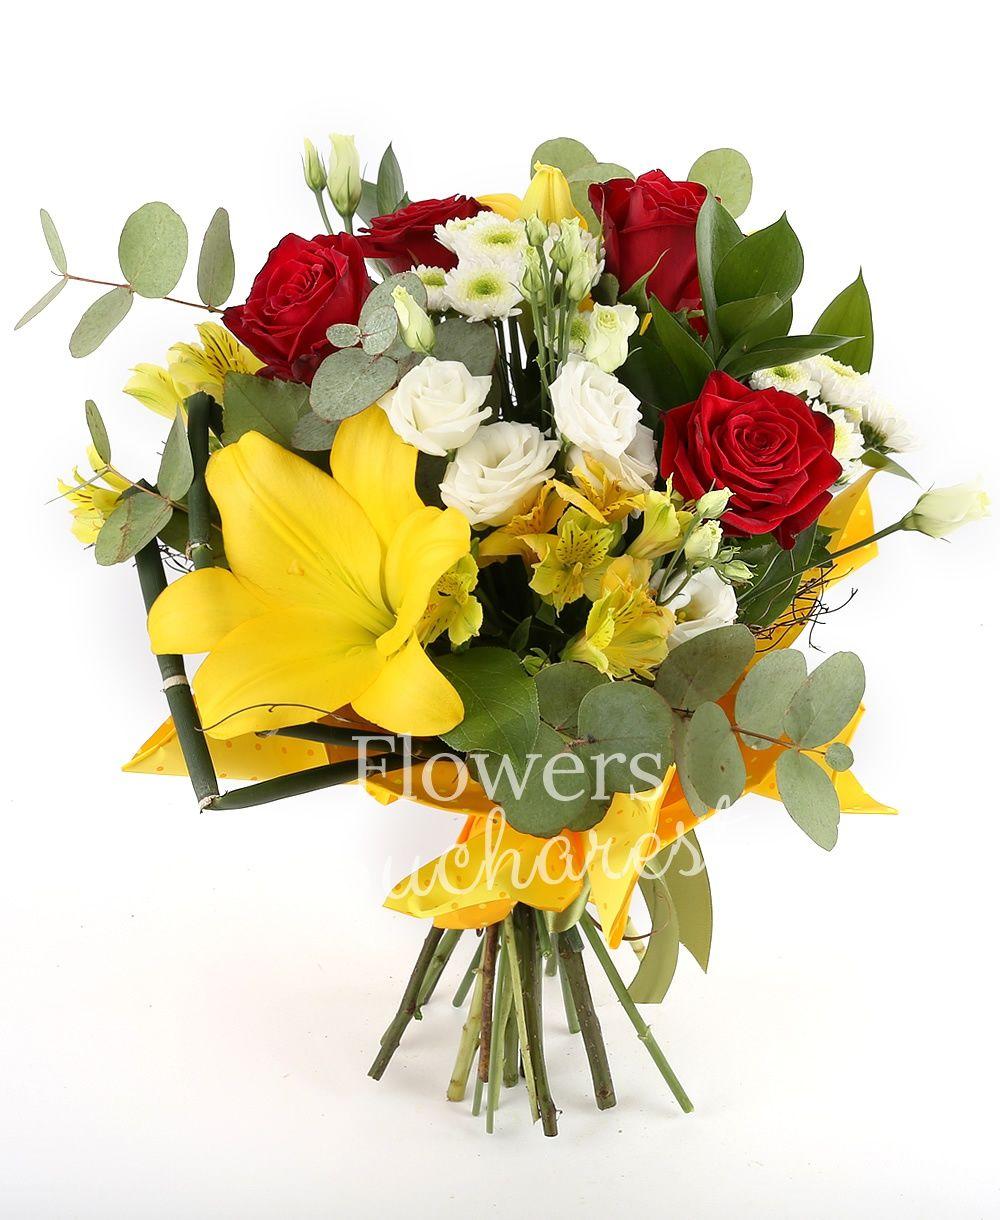 5 red roses, 2 yellow lilies, 3 white santini, 3 yellow alstroemeria, 5 white lisianthus, greenery